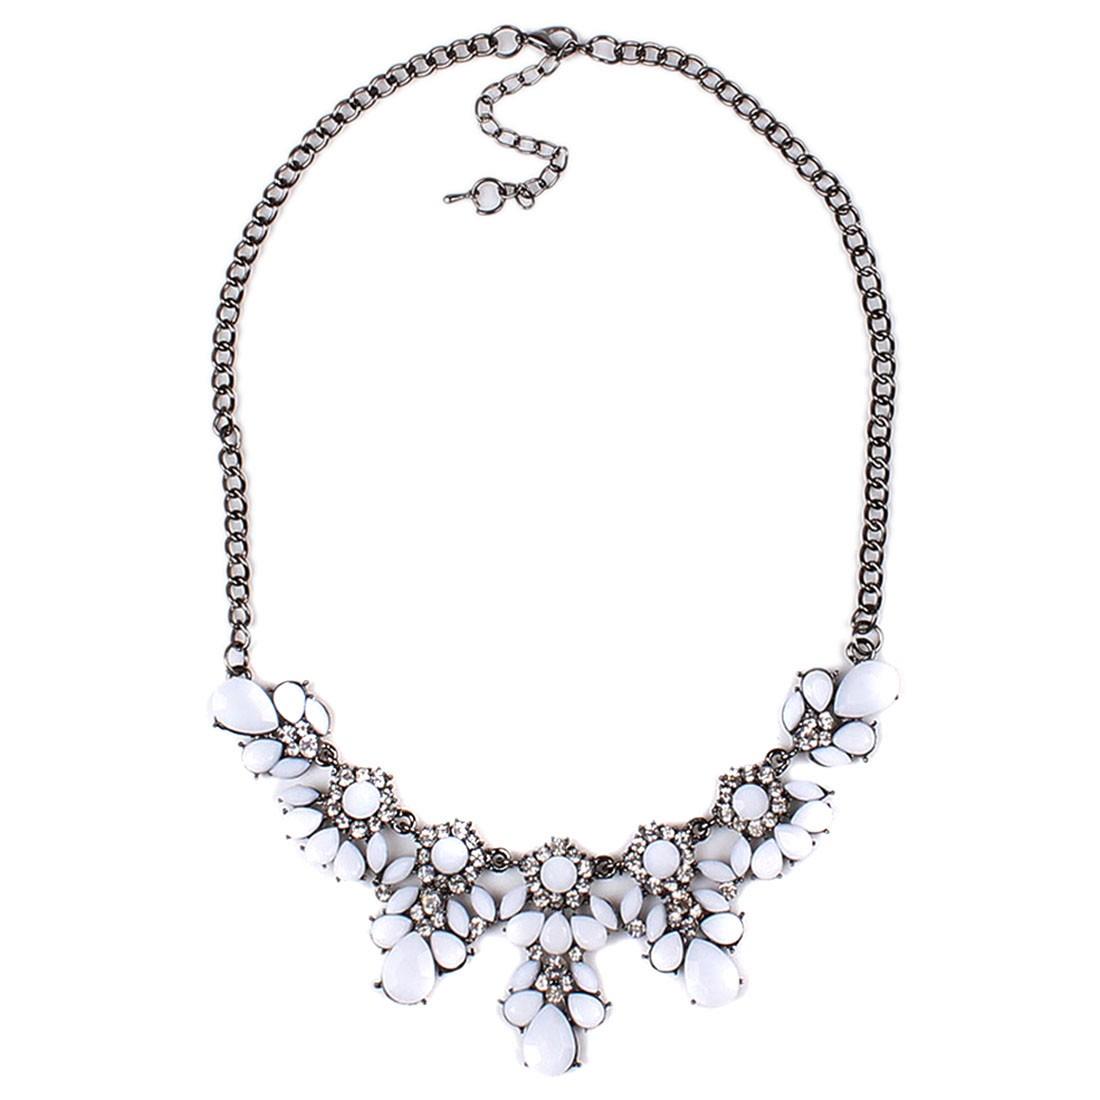 Women's Spring/Summer Fashion Acrylic Flower Bloom Bib Statement Necklace New